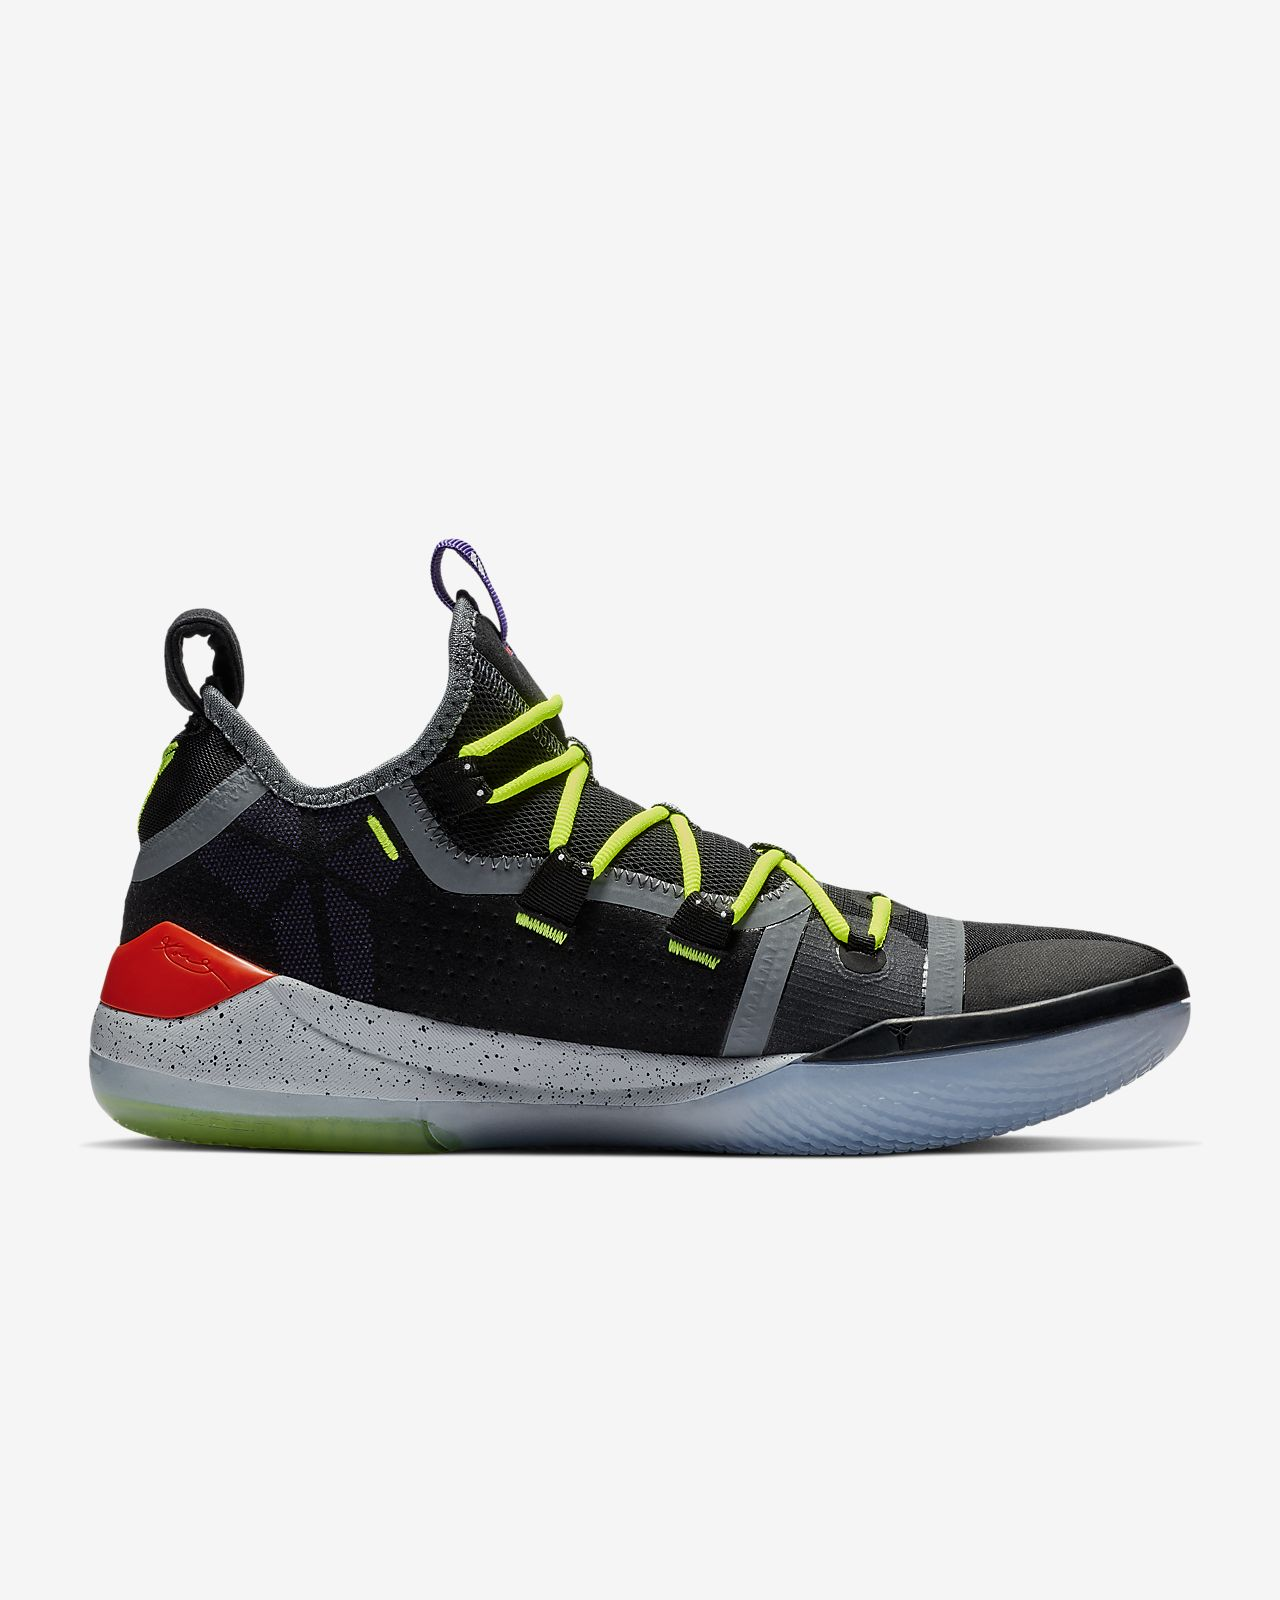 vente chaude en ligne 237c8 f1984 Kobe AD Basketball Shoe